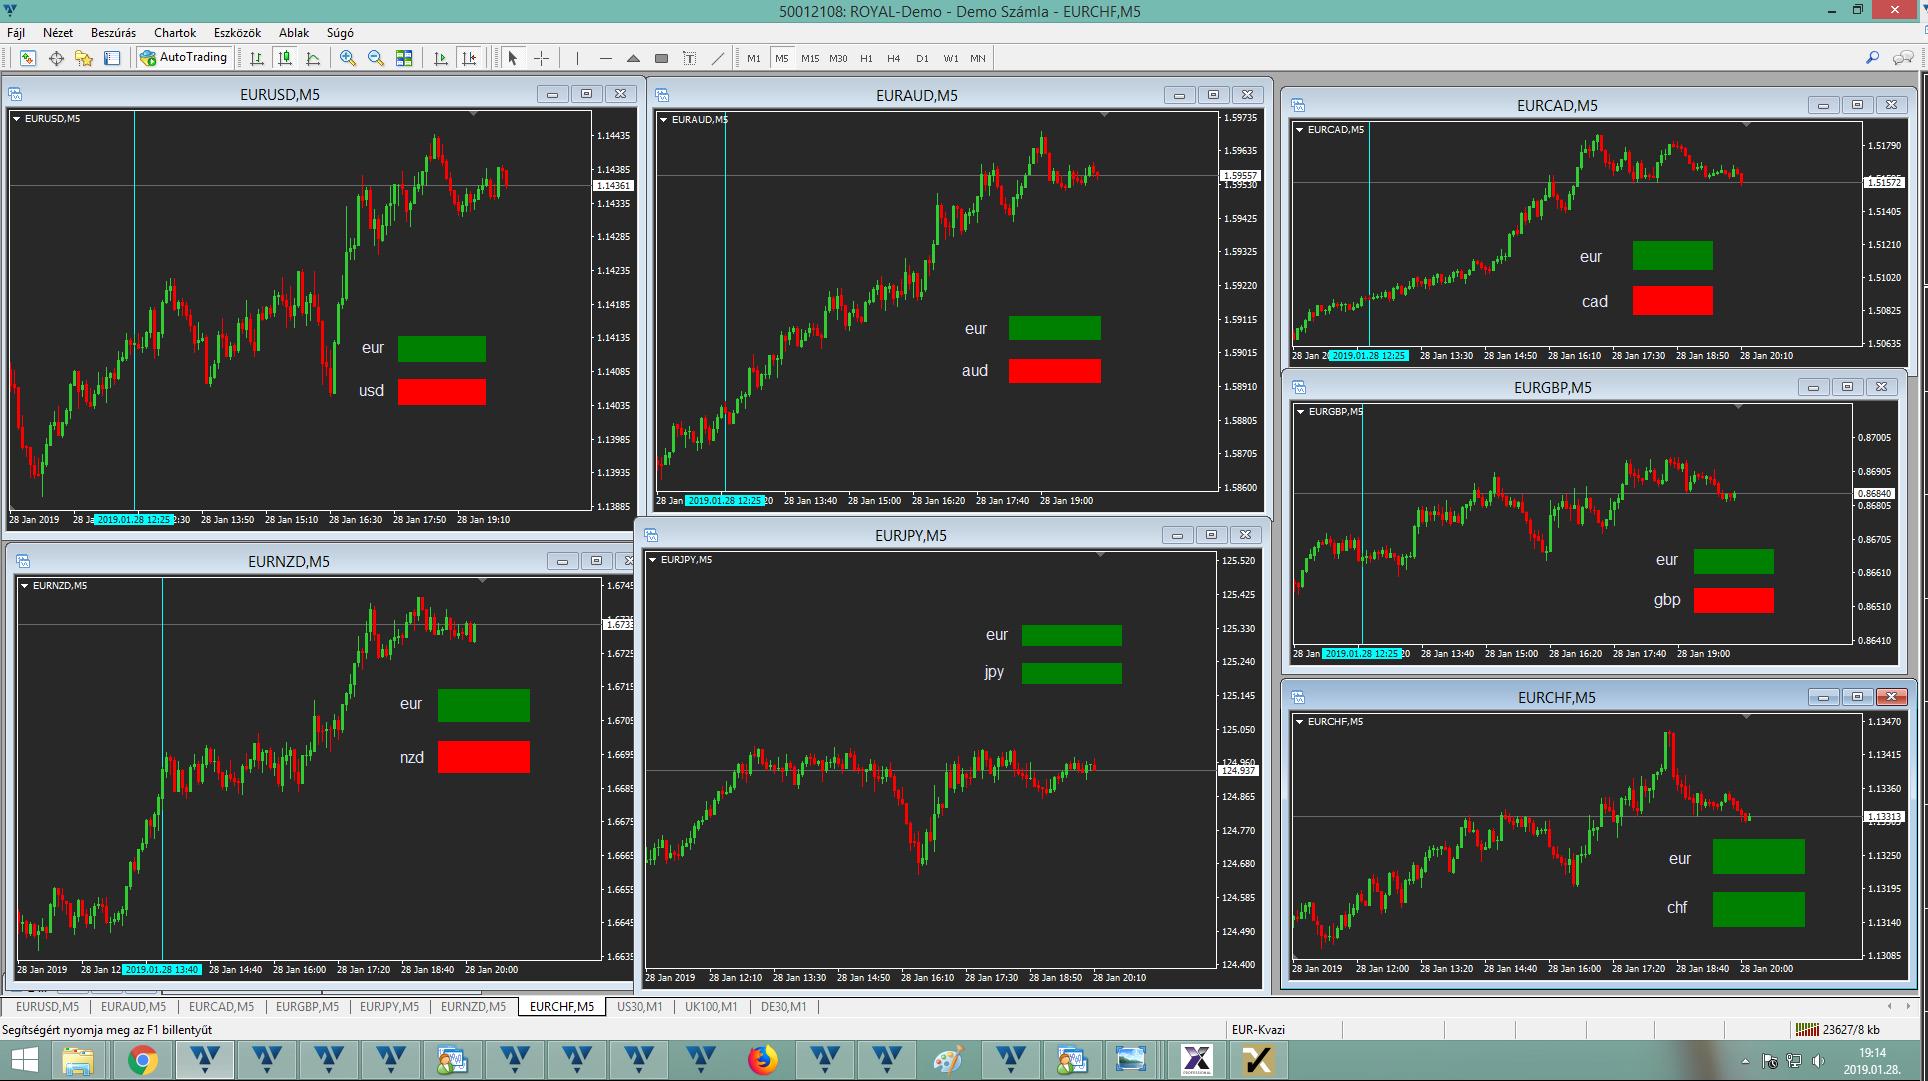 Forex market times utc 8